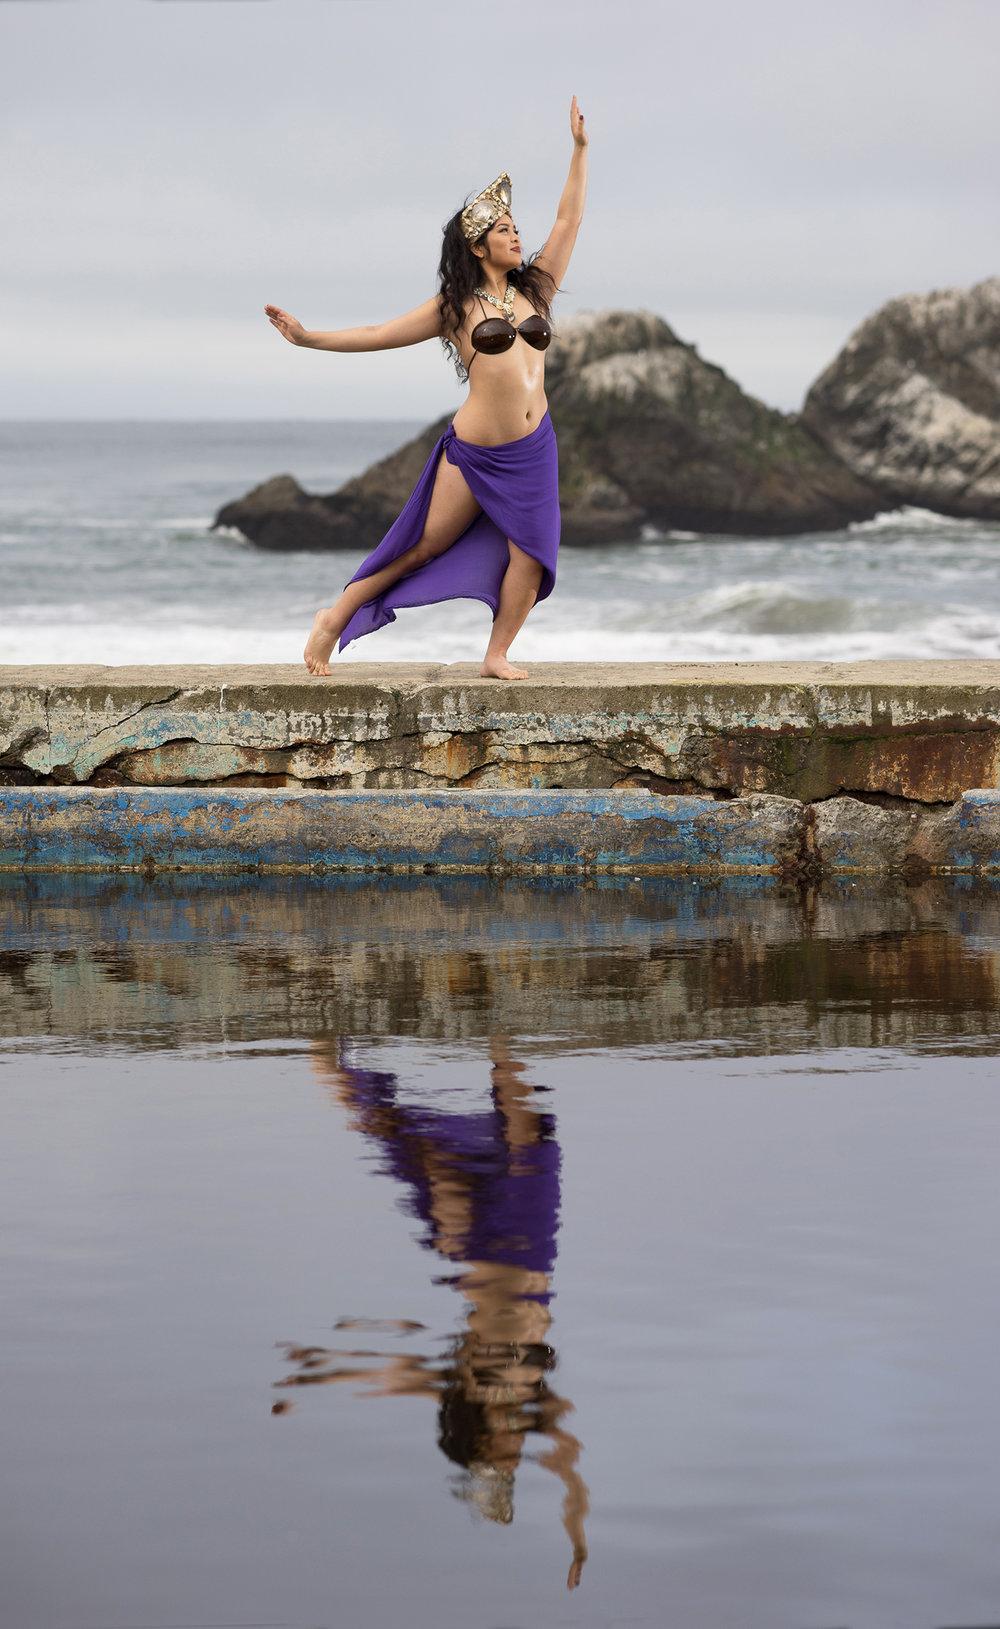 Manuia-Polynesian-Revue-Portrait-Luxchromatic-Photography-Hula-Dance-San-Francisco-Bay-Area-Sony-Alpha-A7Rii-Zeiss-Lens-Profoto-B1-B2-Wescott-Aloha-SonyAlpha-1020.jpg